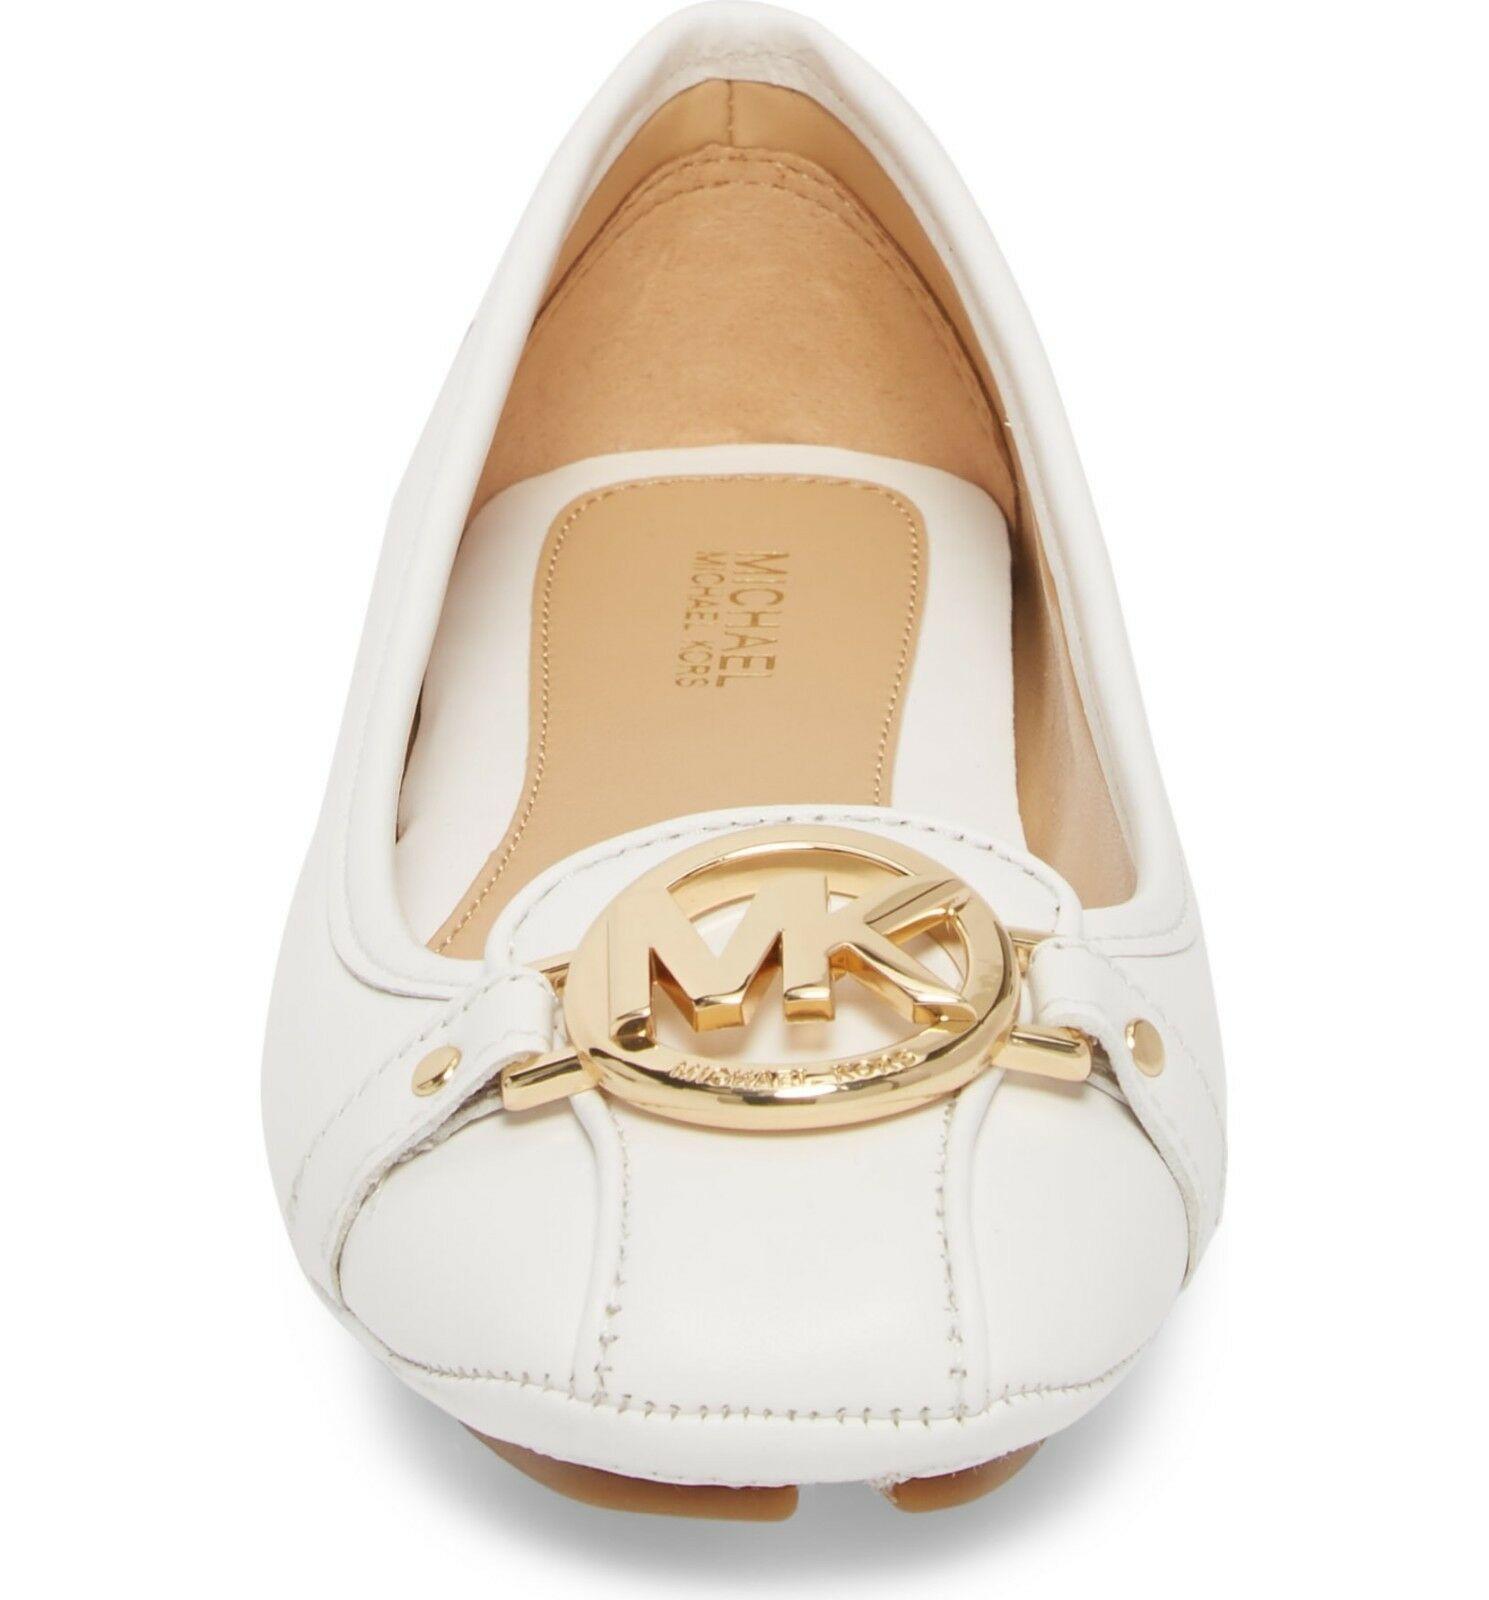 6cb3d7dd192bc Michael Kors MK Women's Premium Designer Fulton Moccasin Flats Optic White